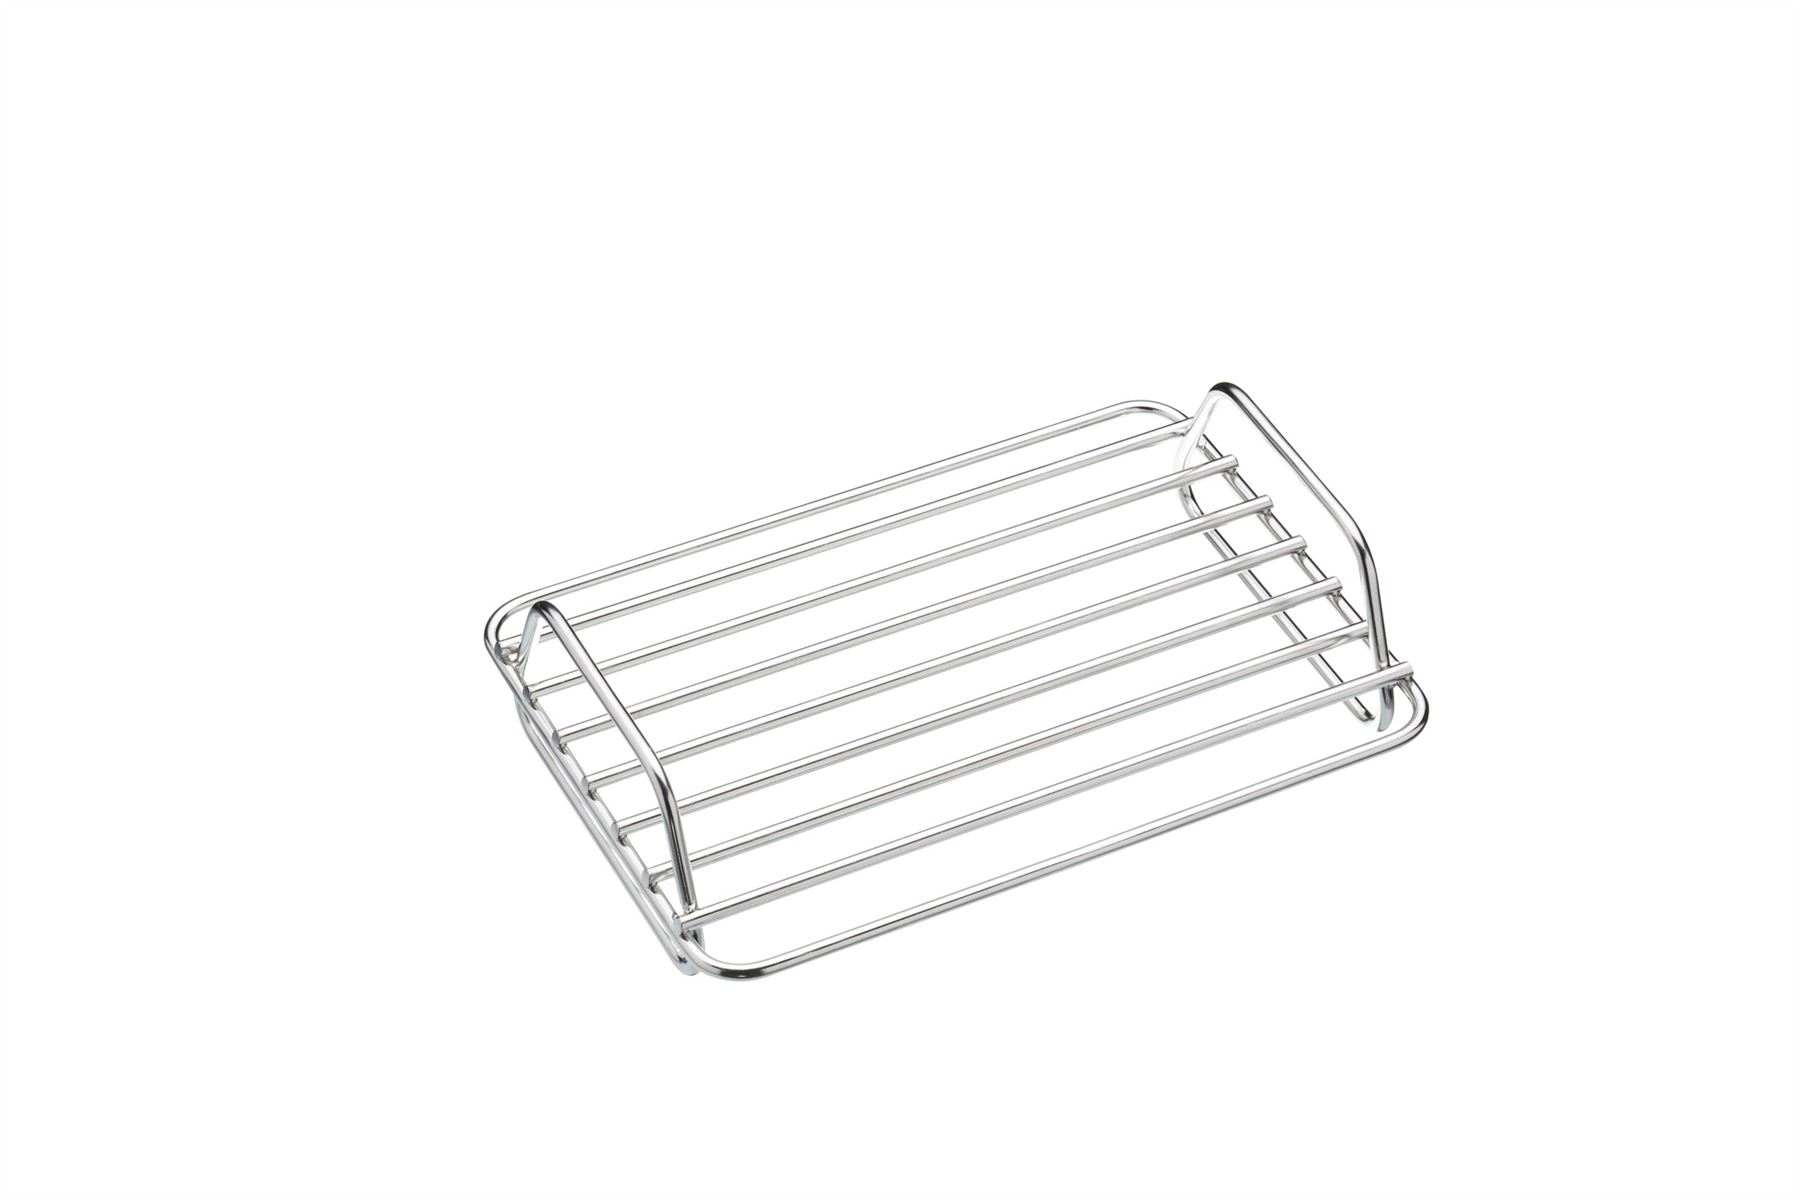 Masterclass Stainless Steel Small Roasting Rack